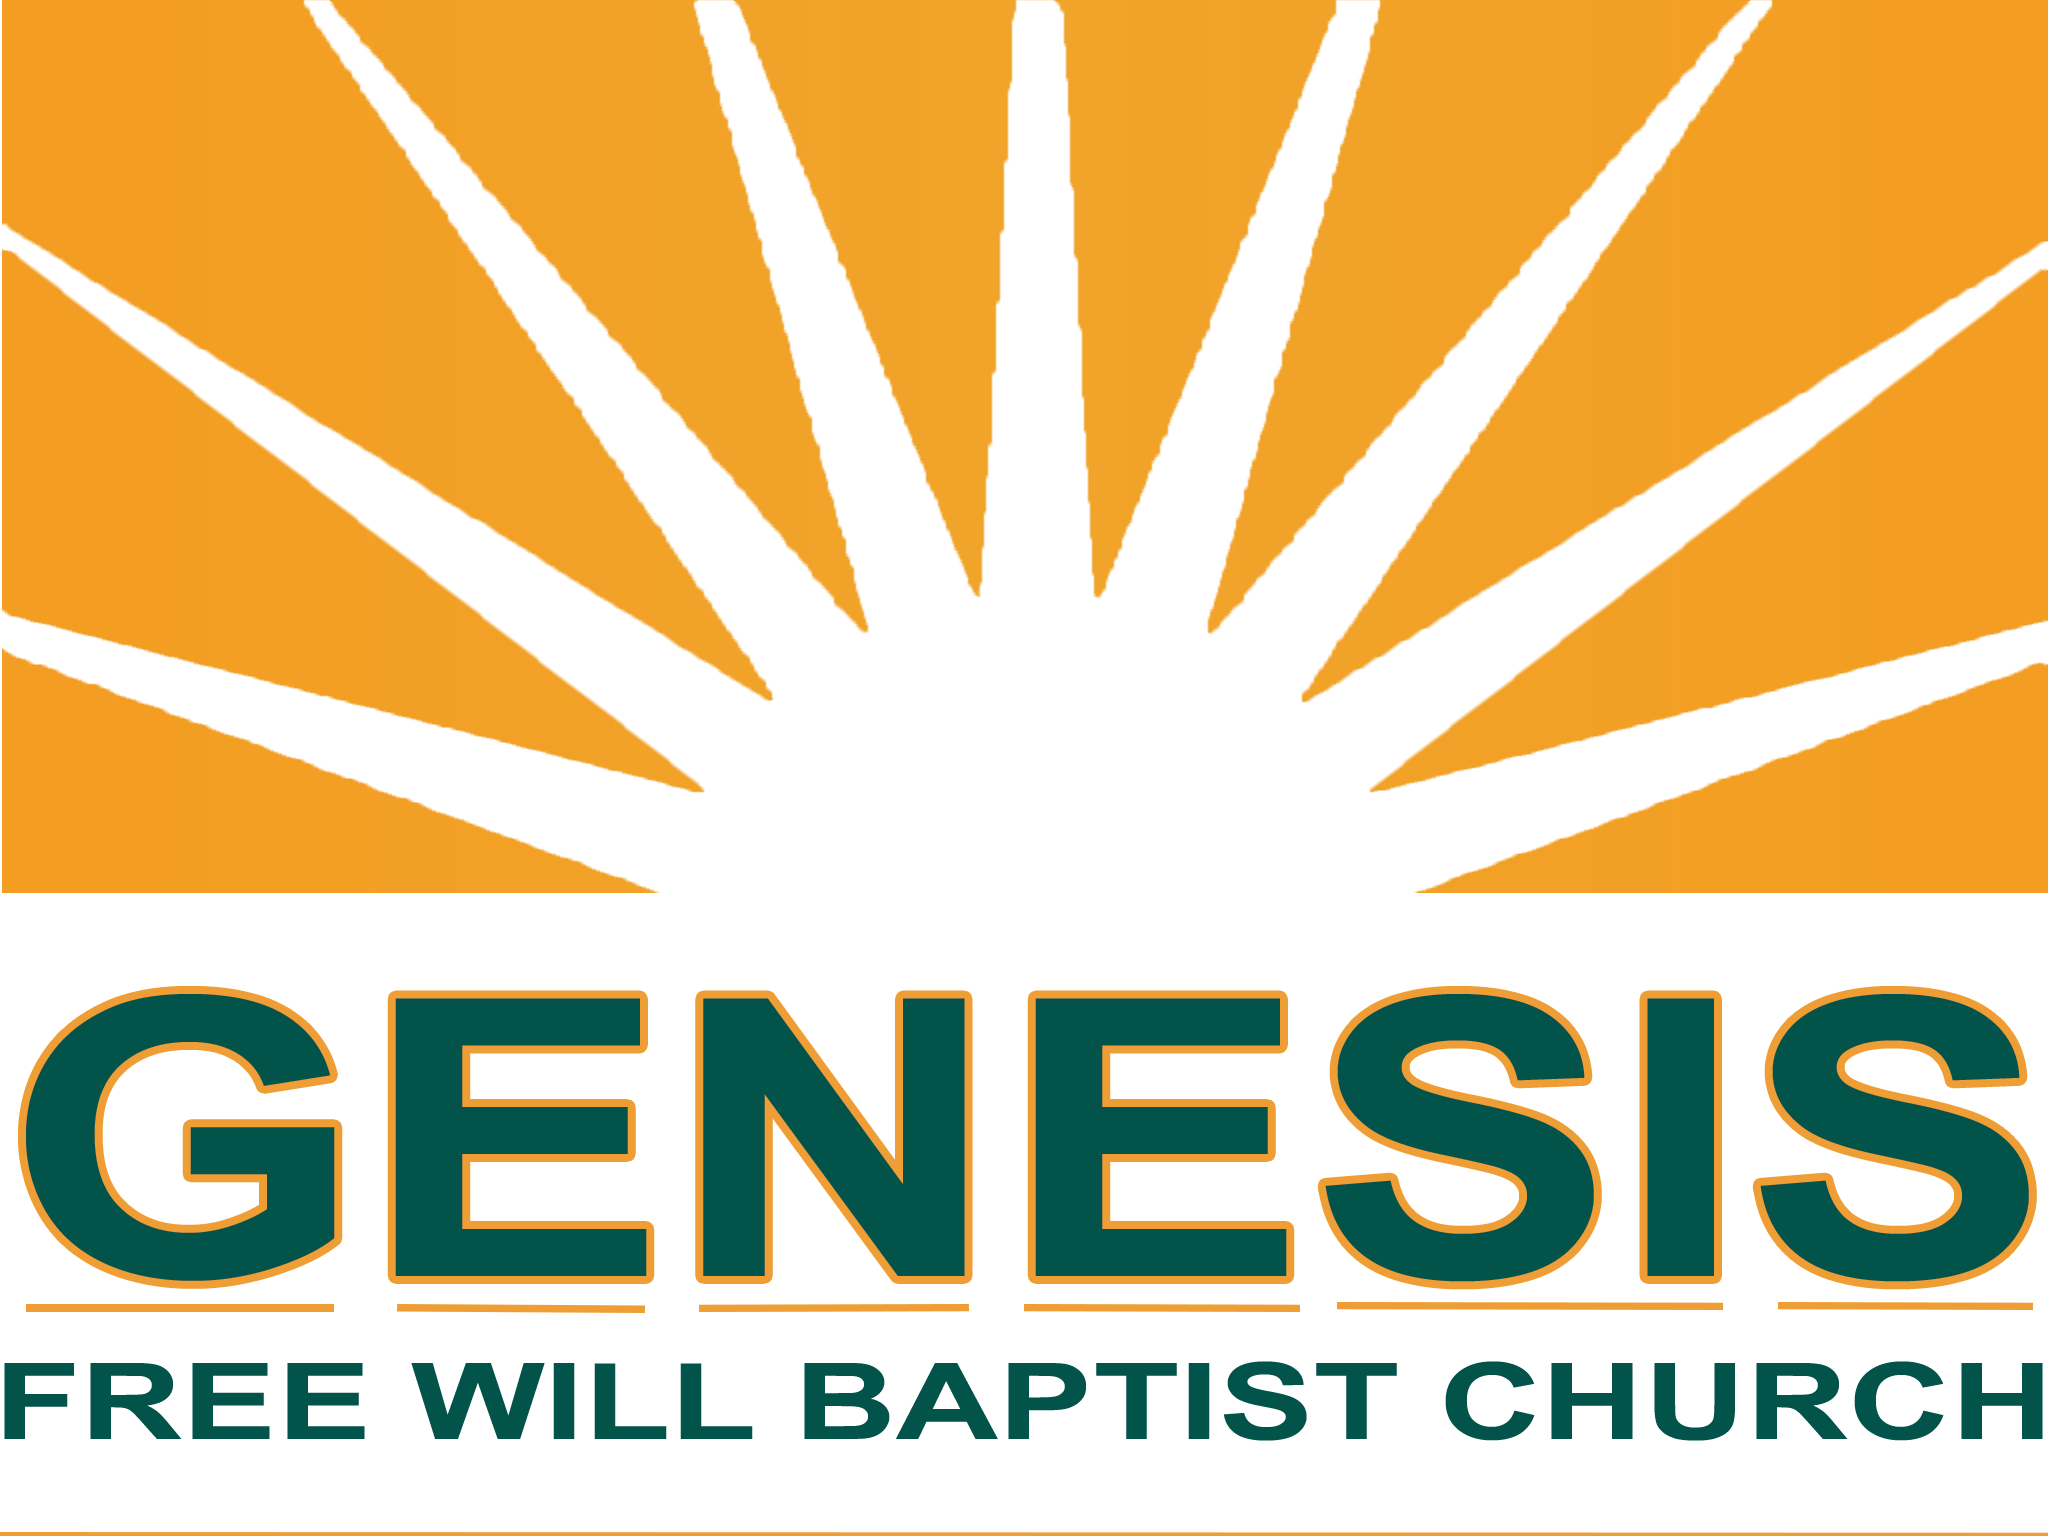 Genesis Free Will Baptist Church